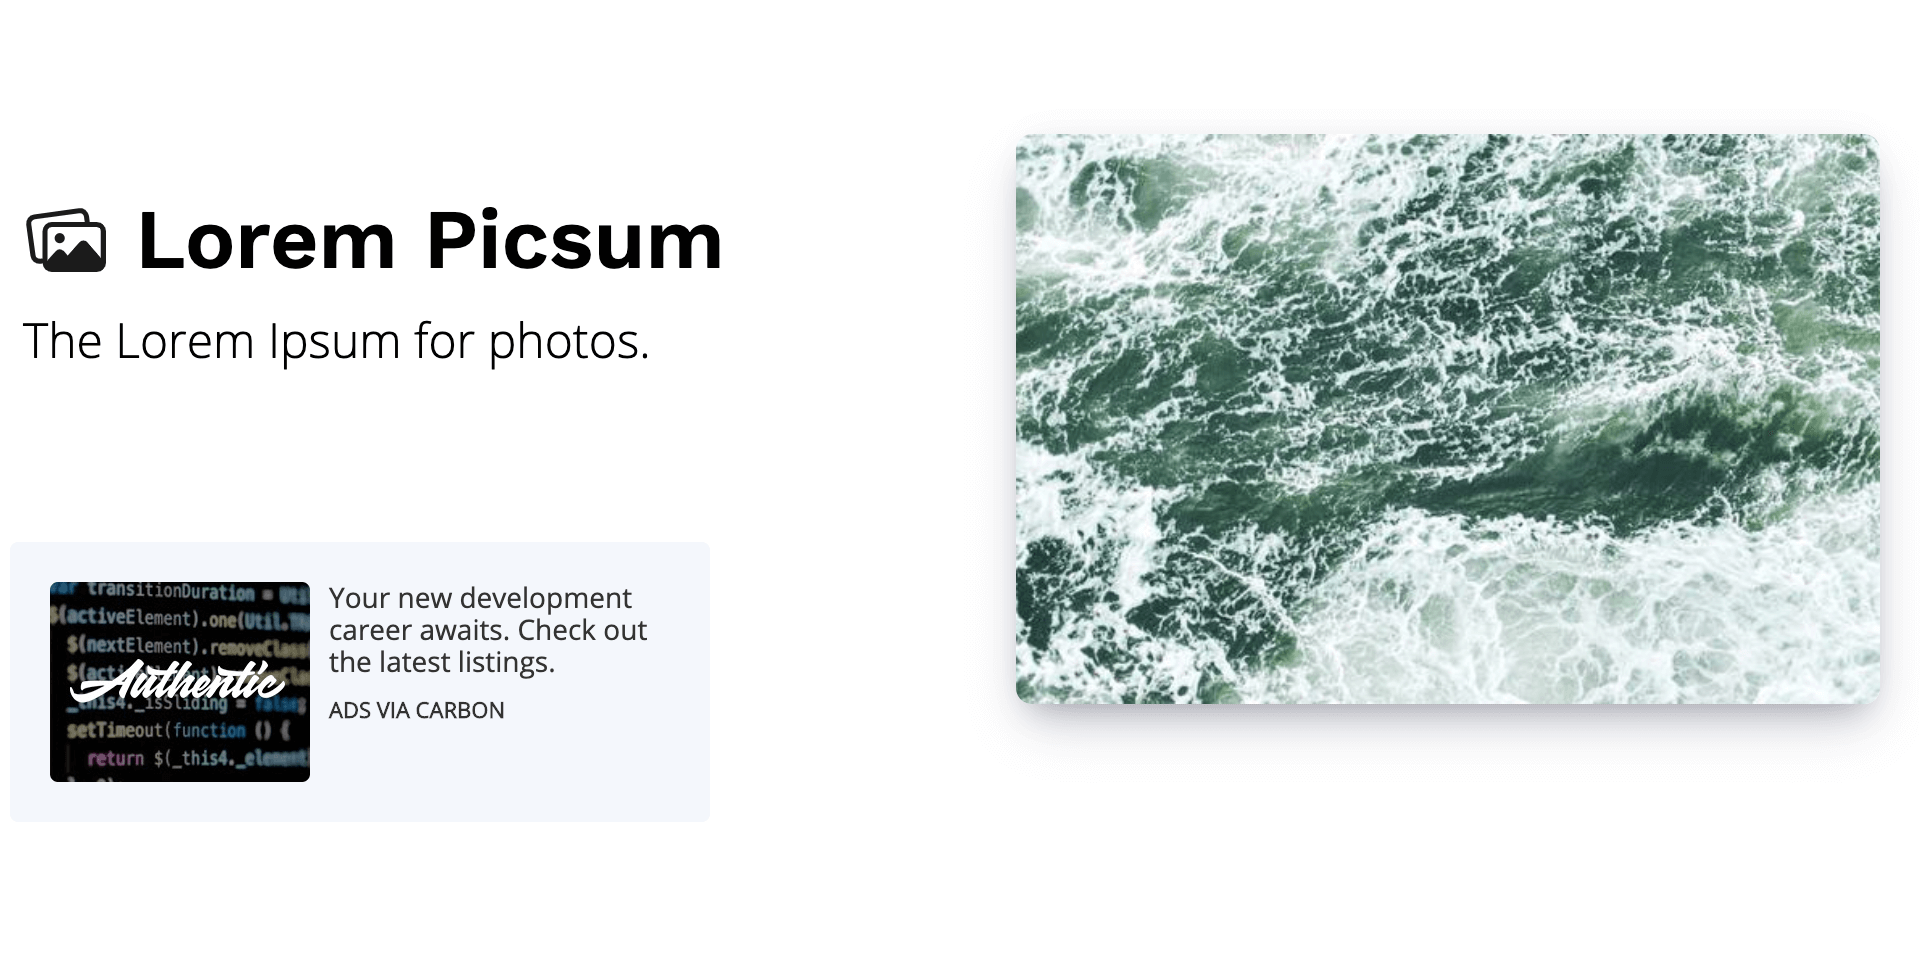 Lorem Picsum